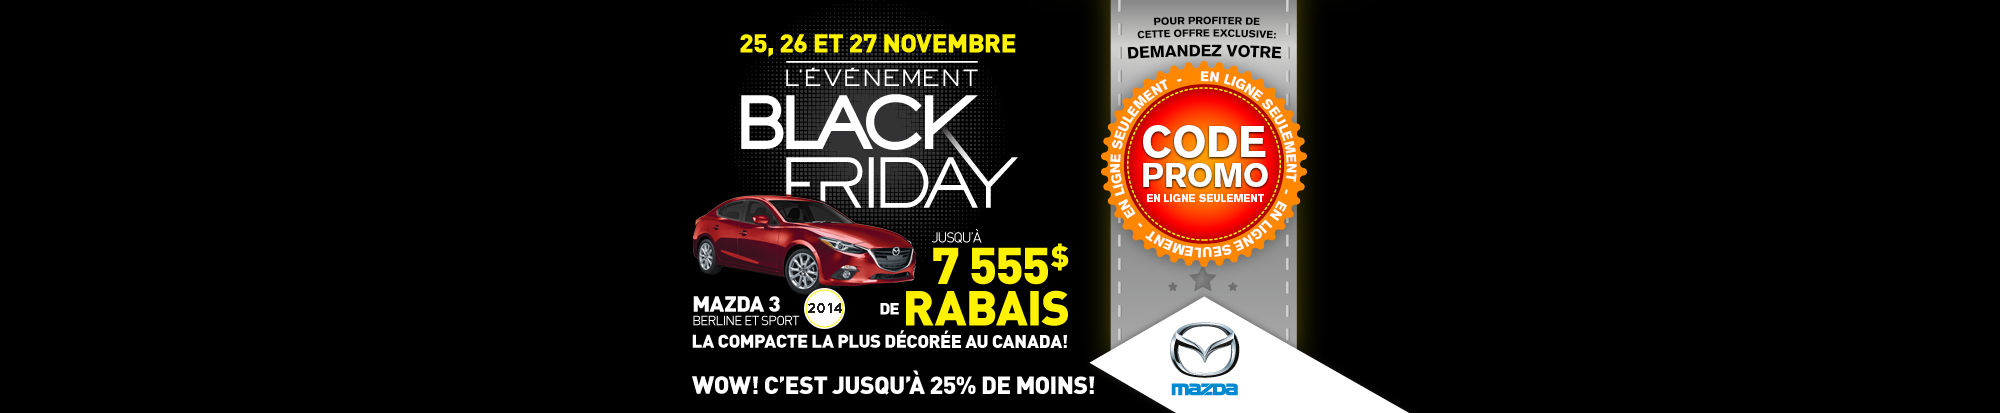 Mazda- Black Friday